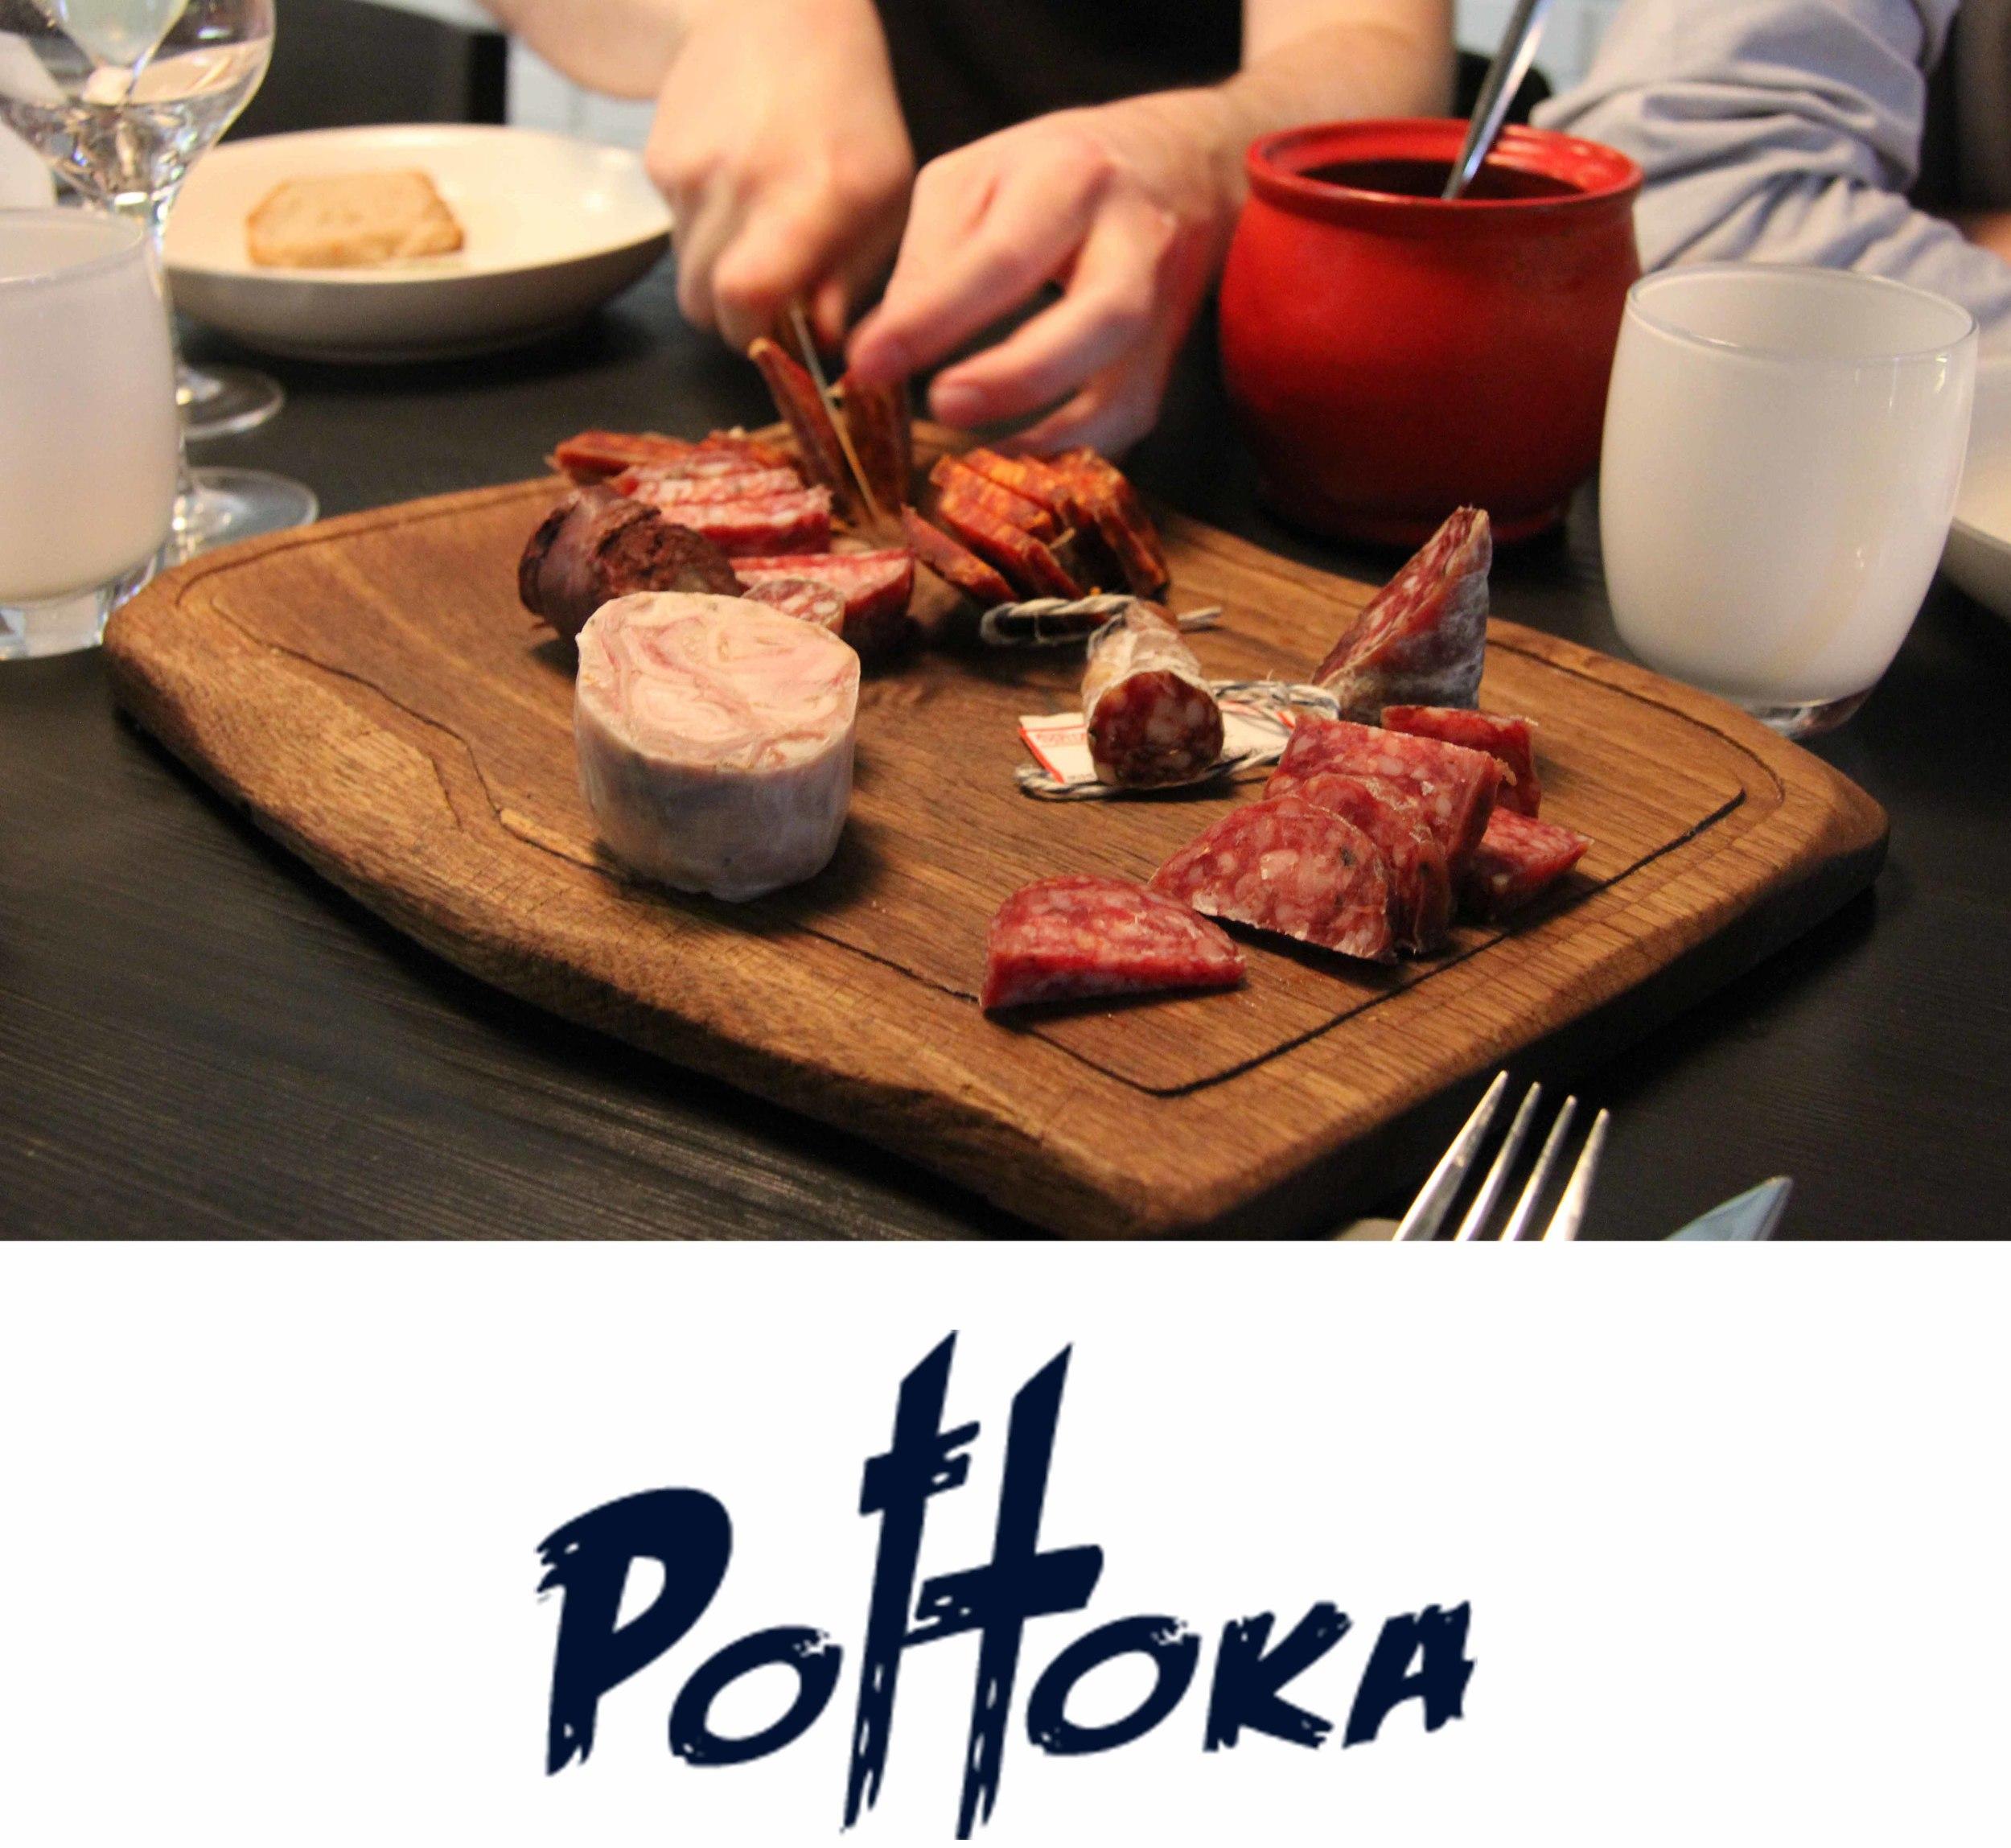 Pottoka - Bonnes adresses Paris - www.theflyingflour.com